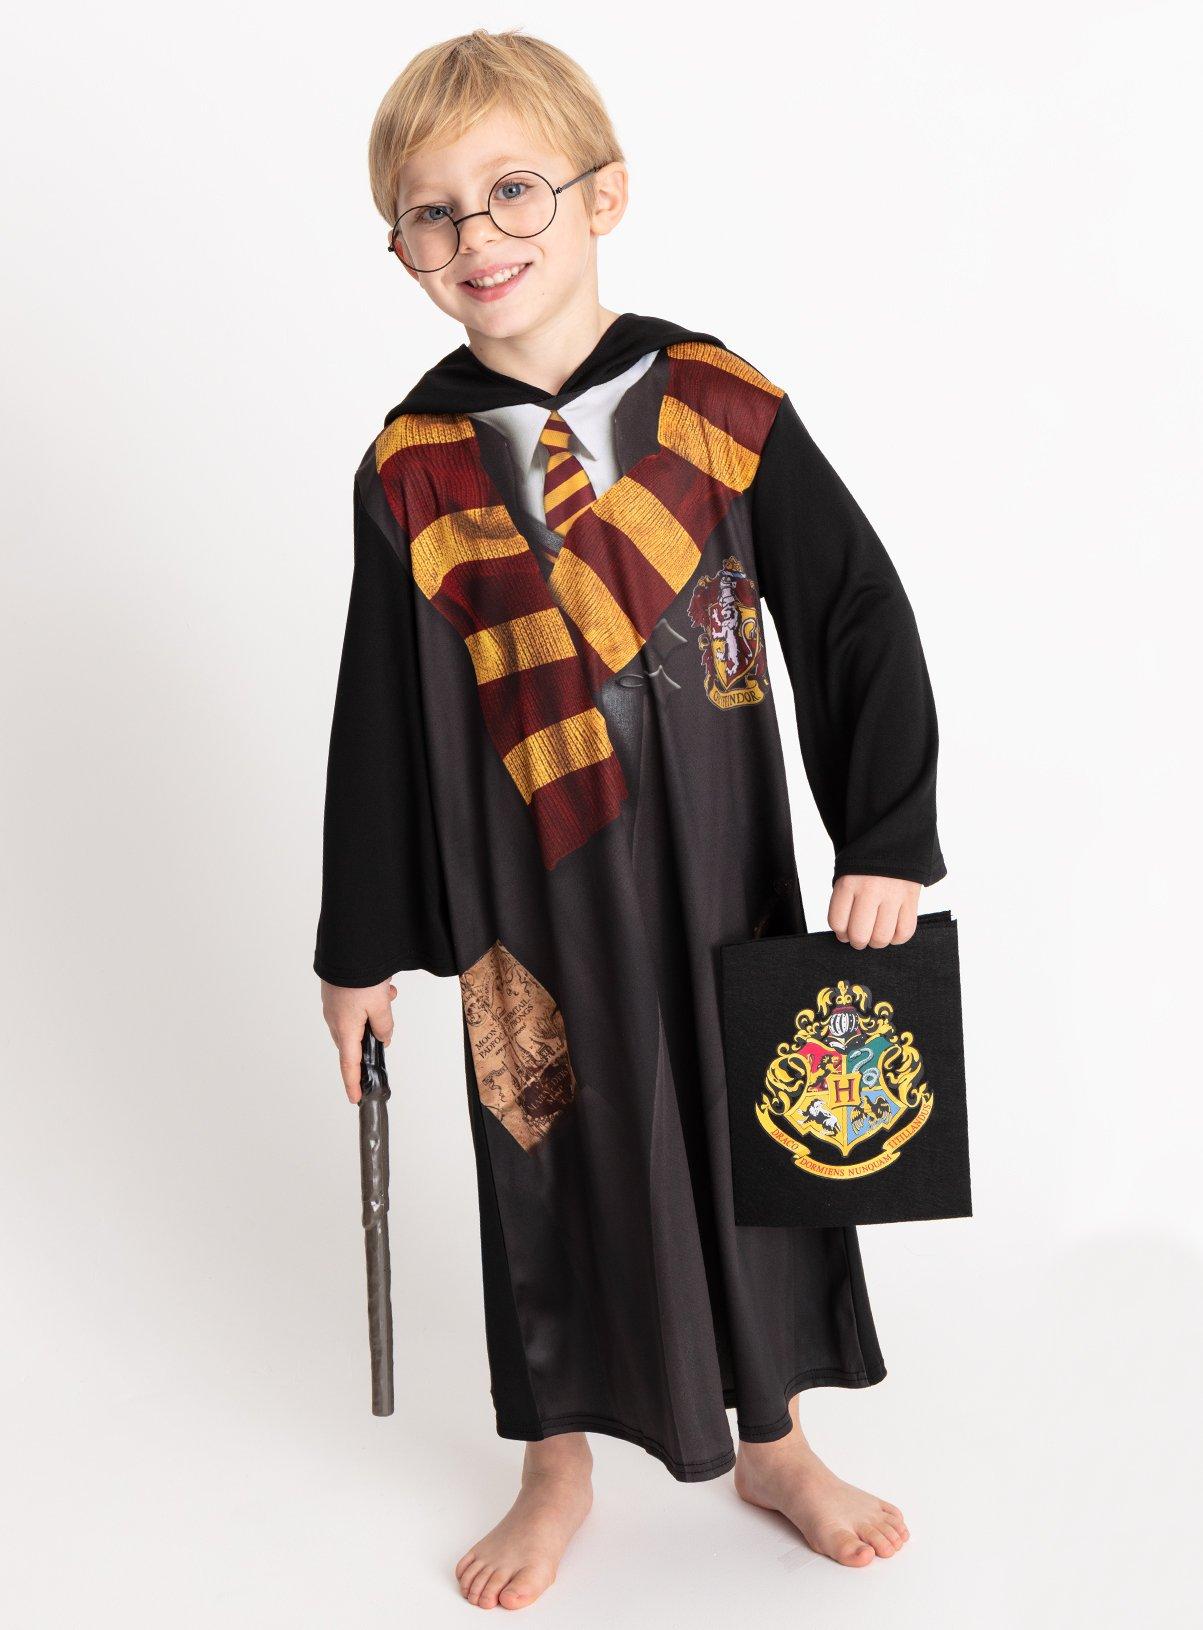 Harry Potter Black Gryffindor Costume - 11-12 years